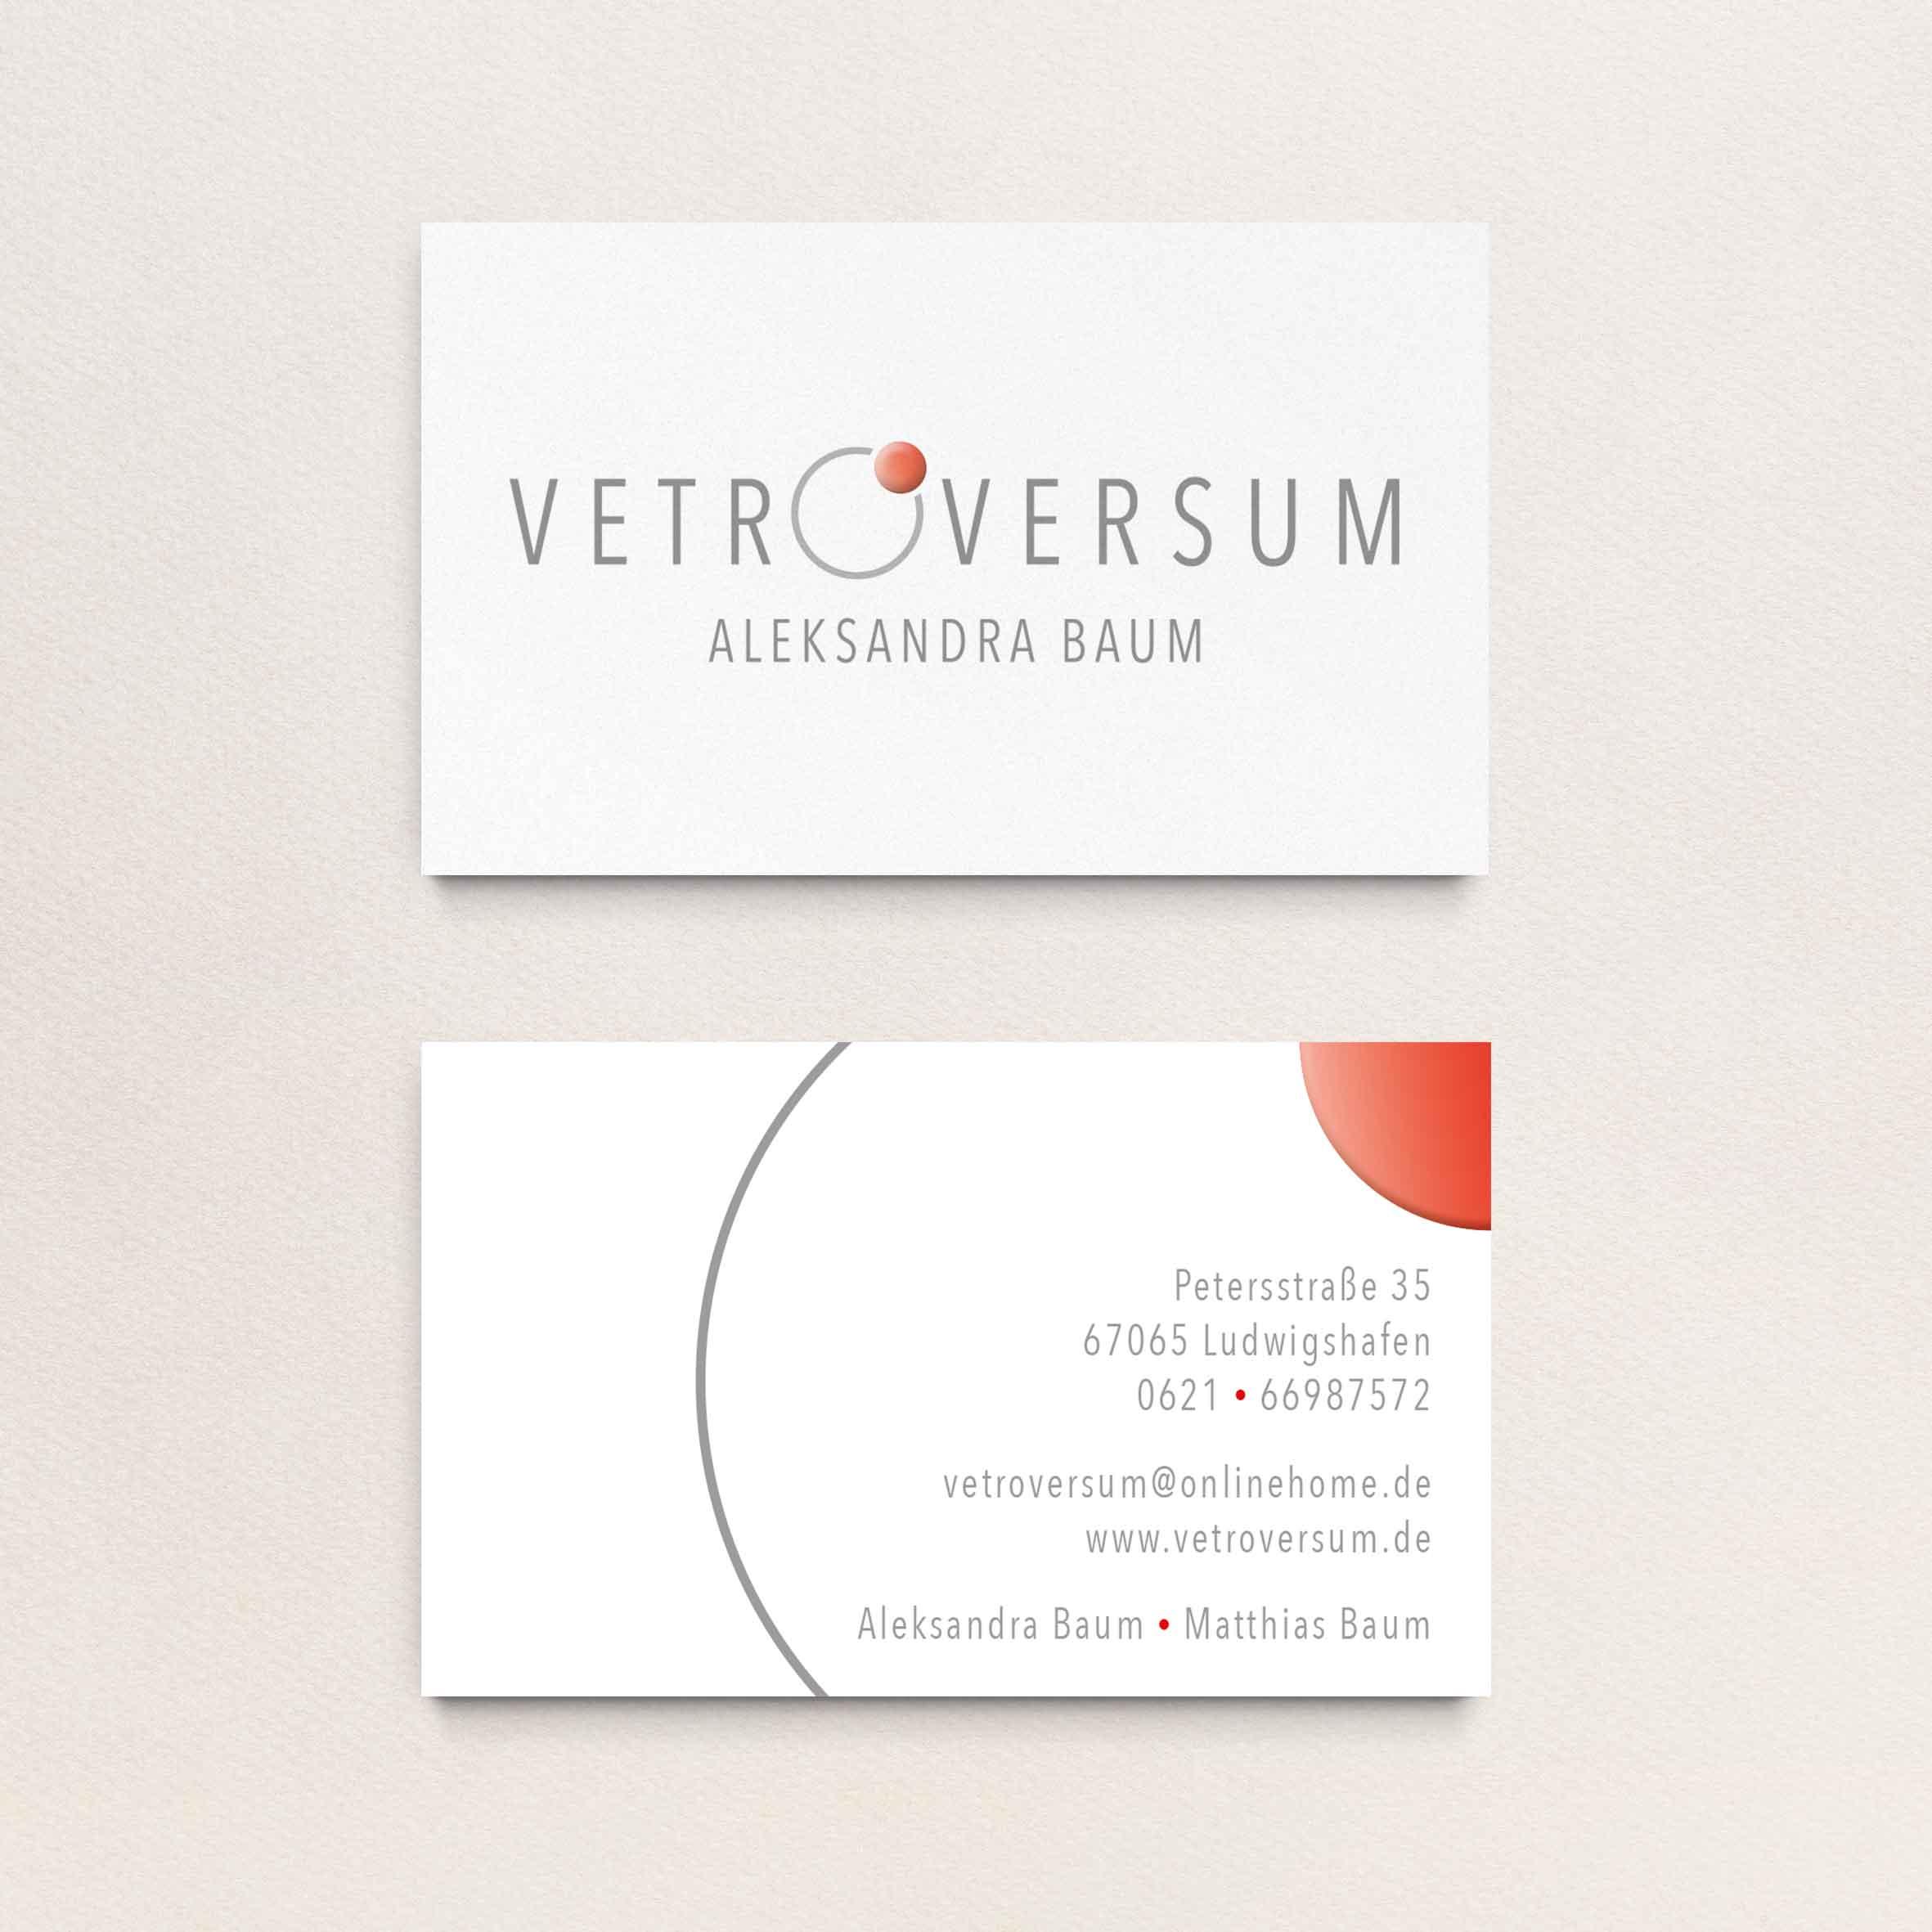 vetroversum visitenkarten